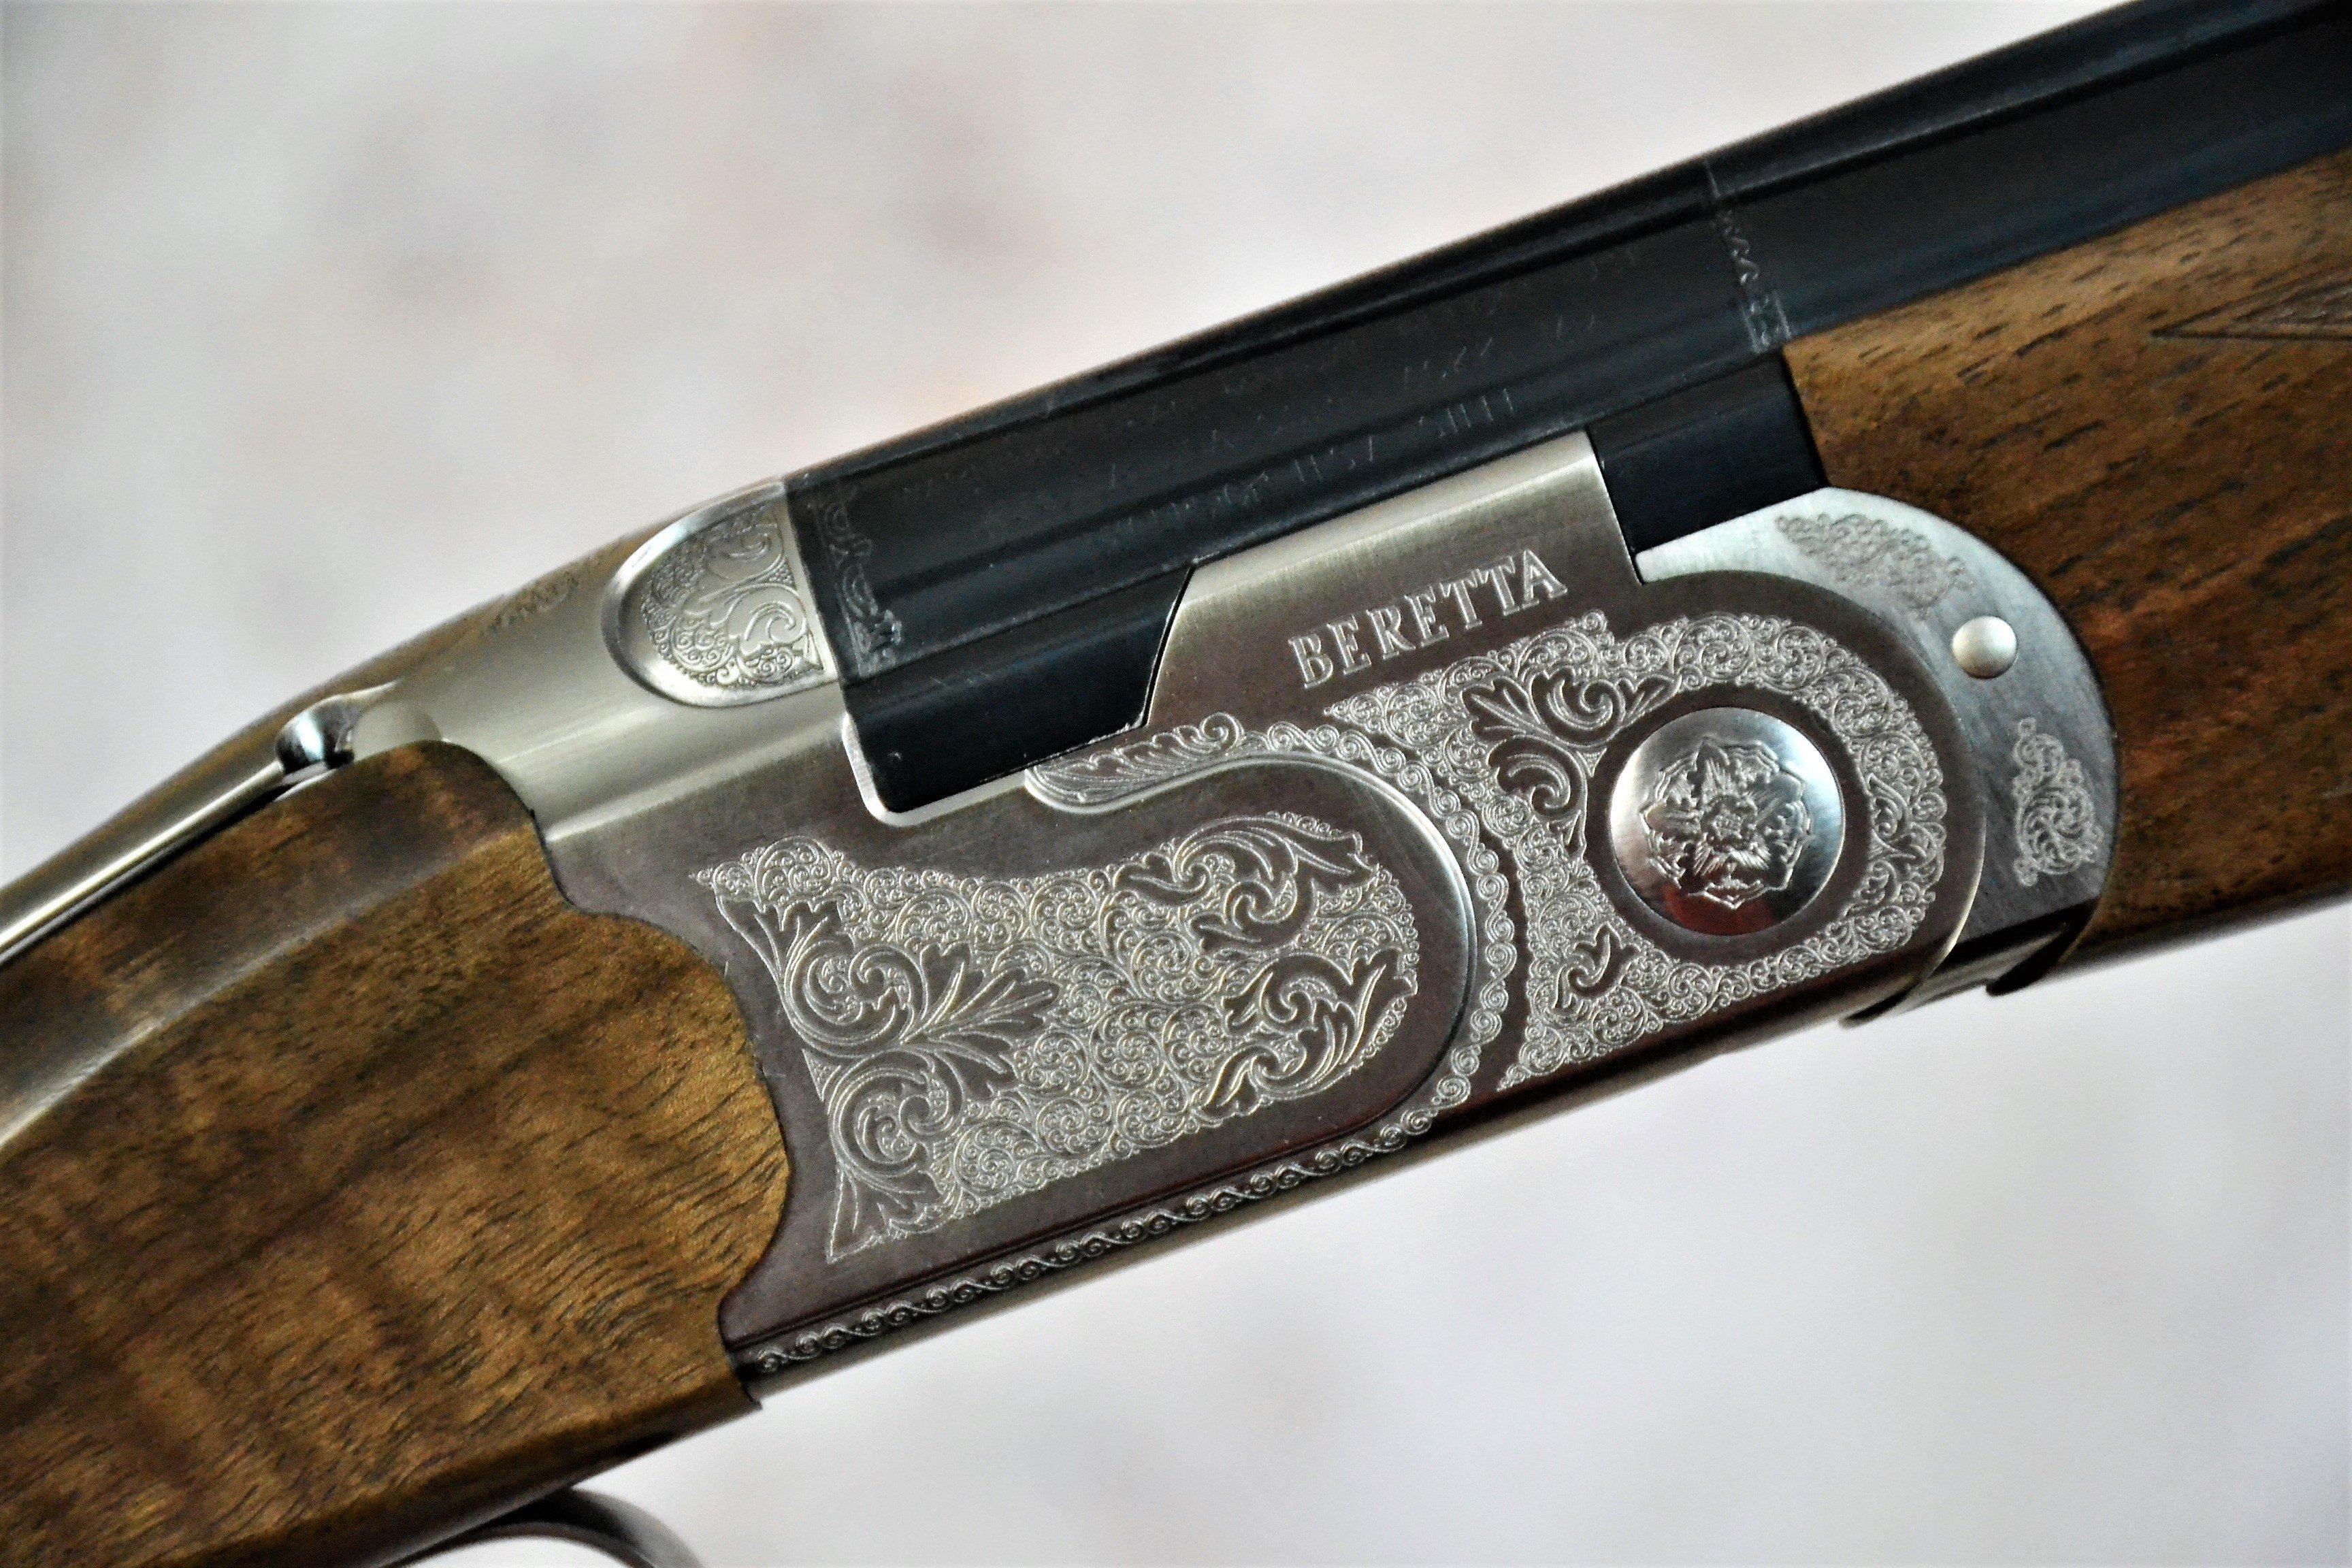 Shotgun Review: Beretta 686 Silver Pigeon I